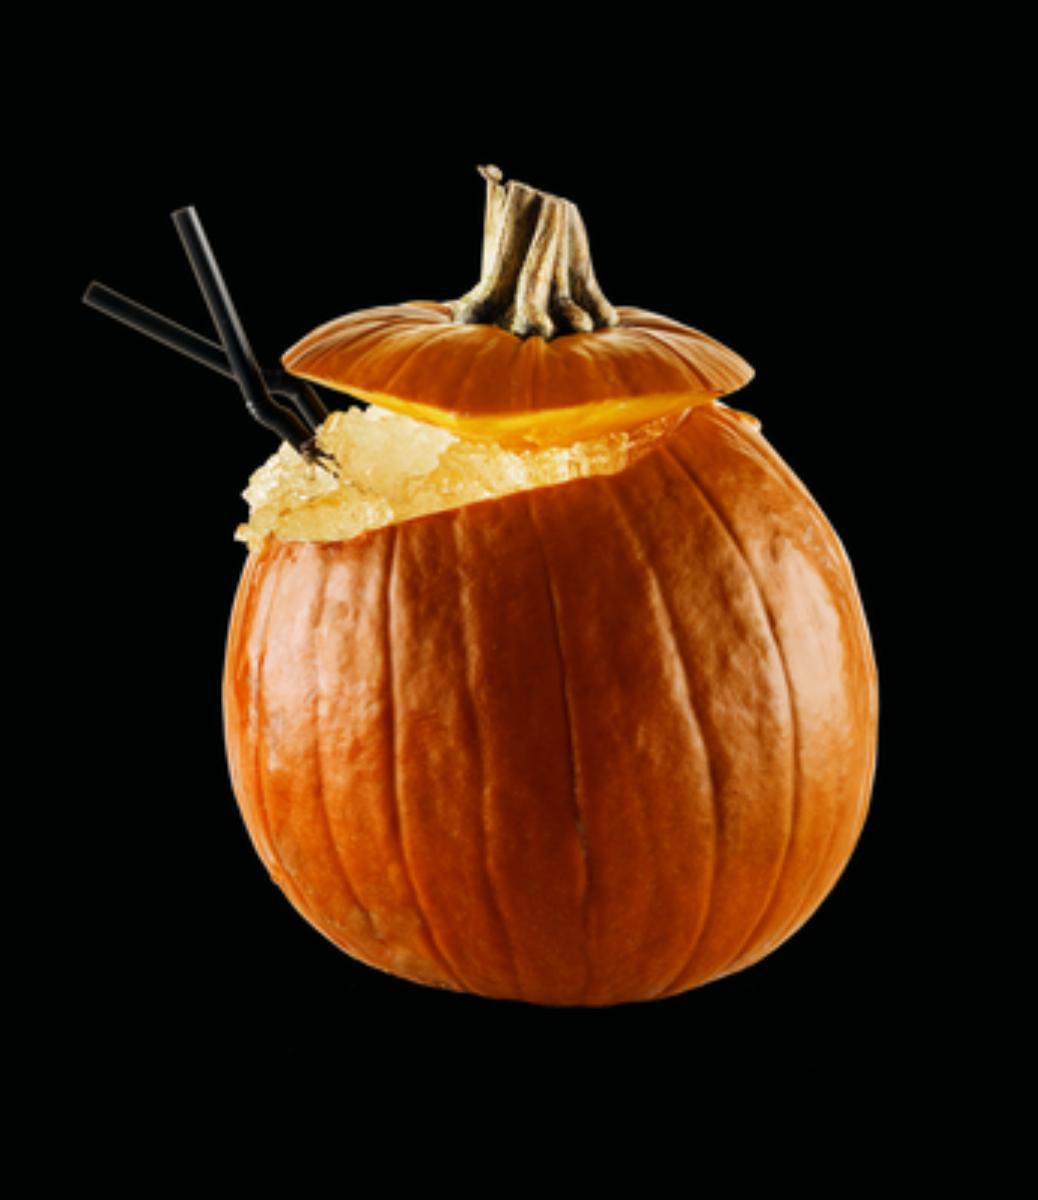 Taste the Halloween_Drink